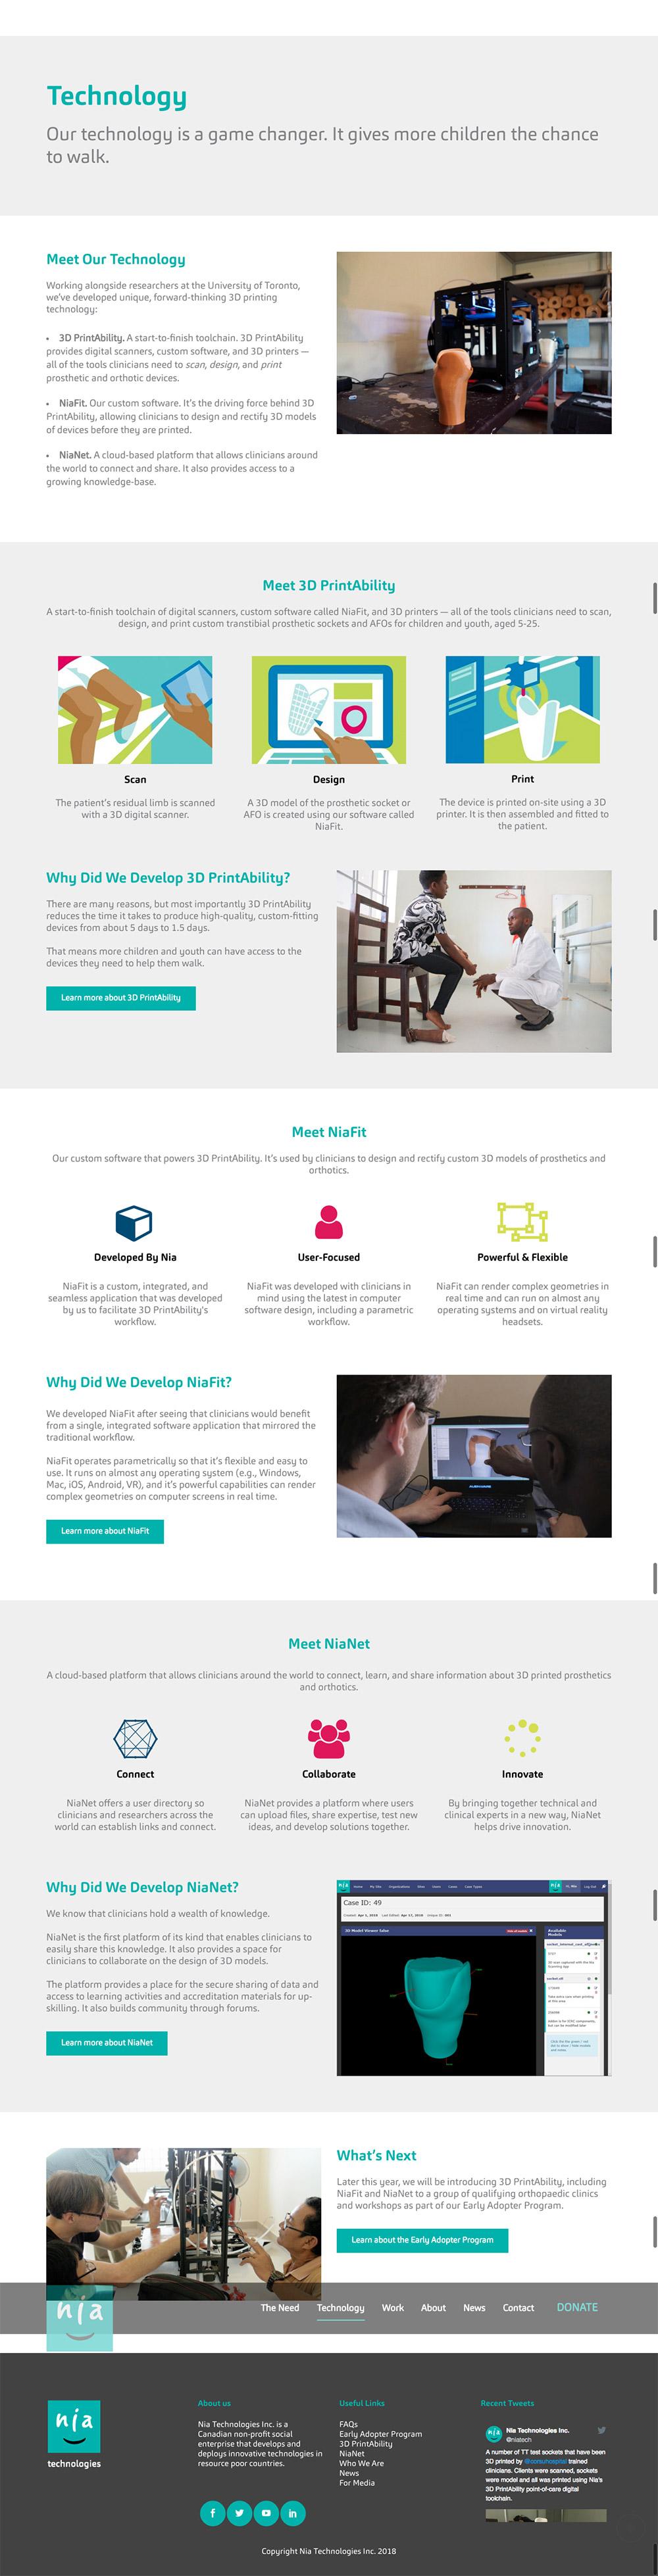 Copywriting sample - Nia Technologies website